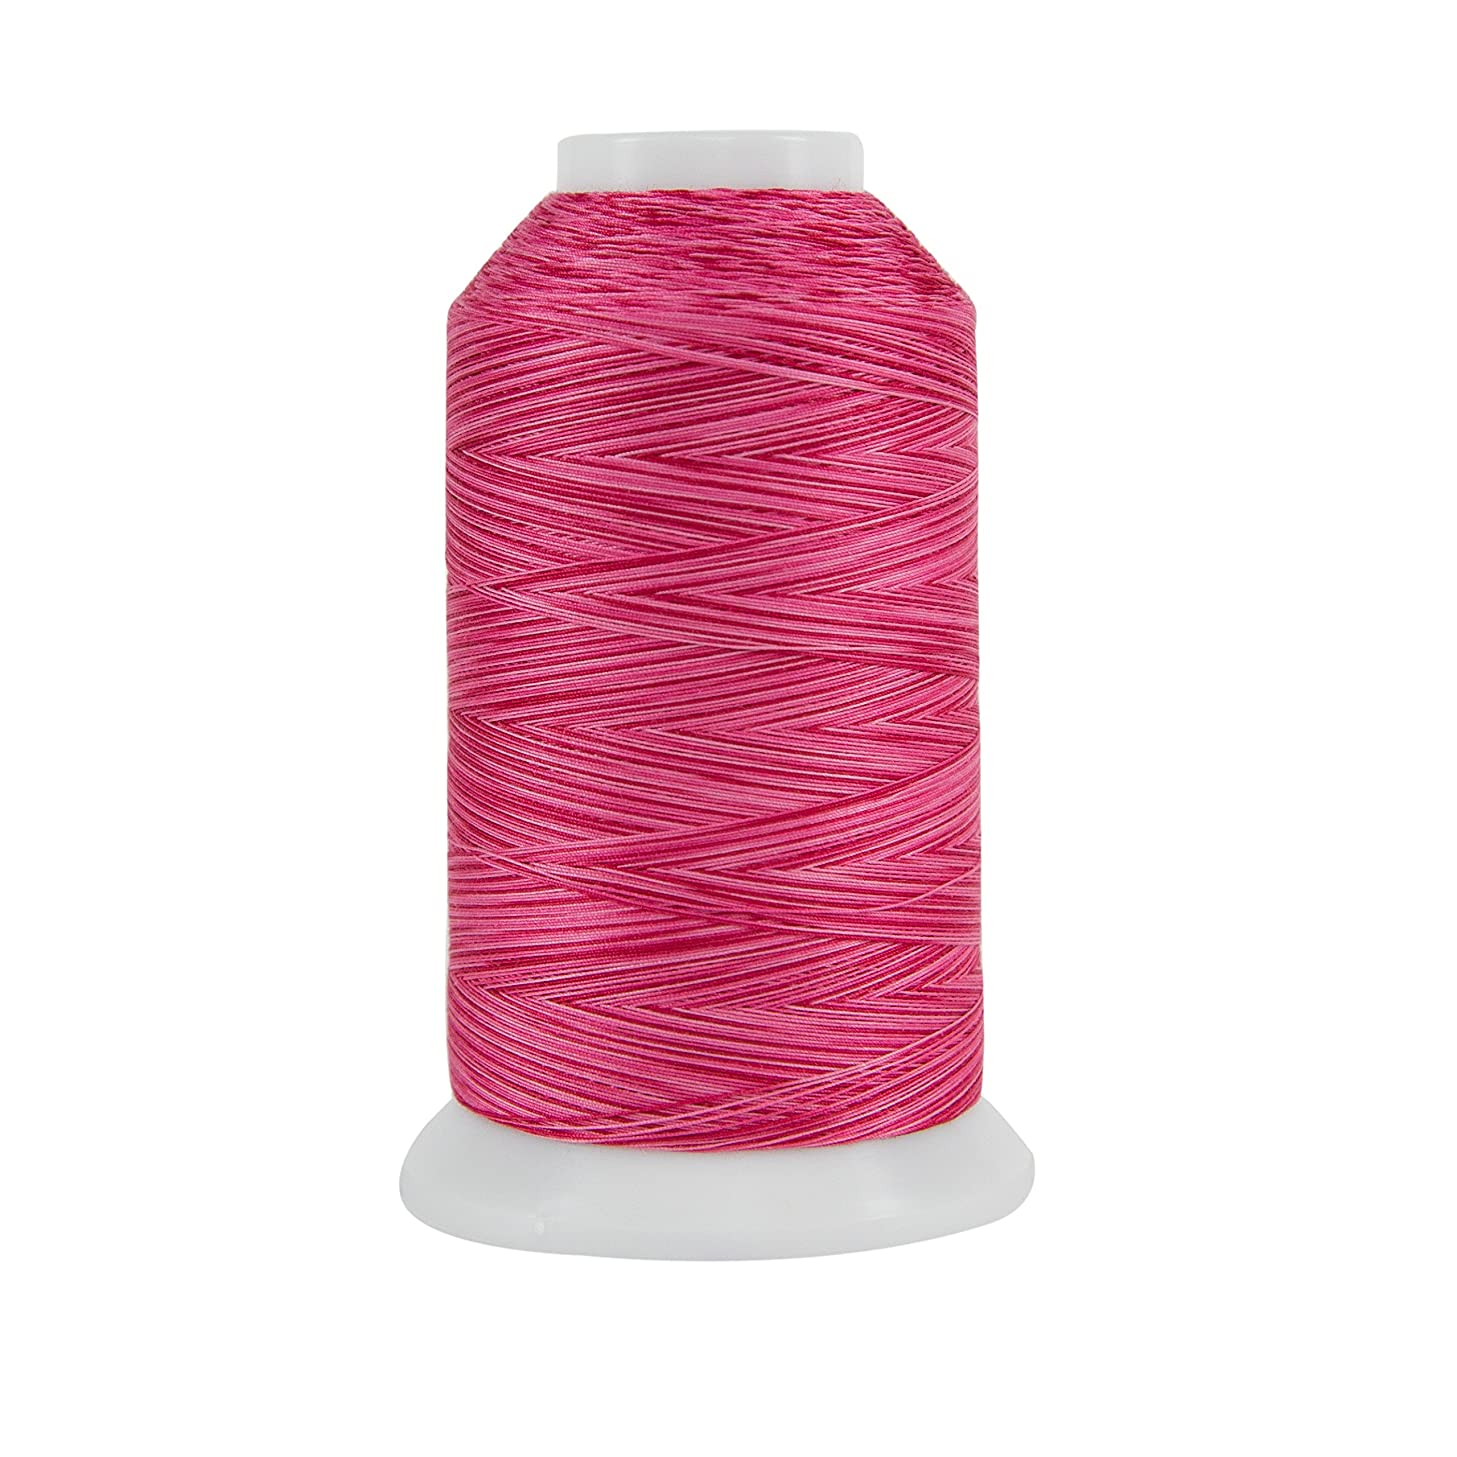 Superior Threads 121029XX926 Red Sea 3-Ply 40W King TUT Cotton Quilting Thread, 2000 yd